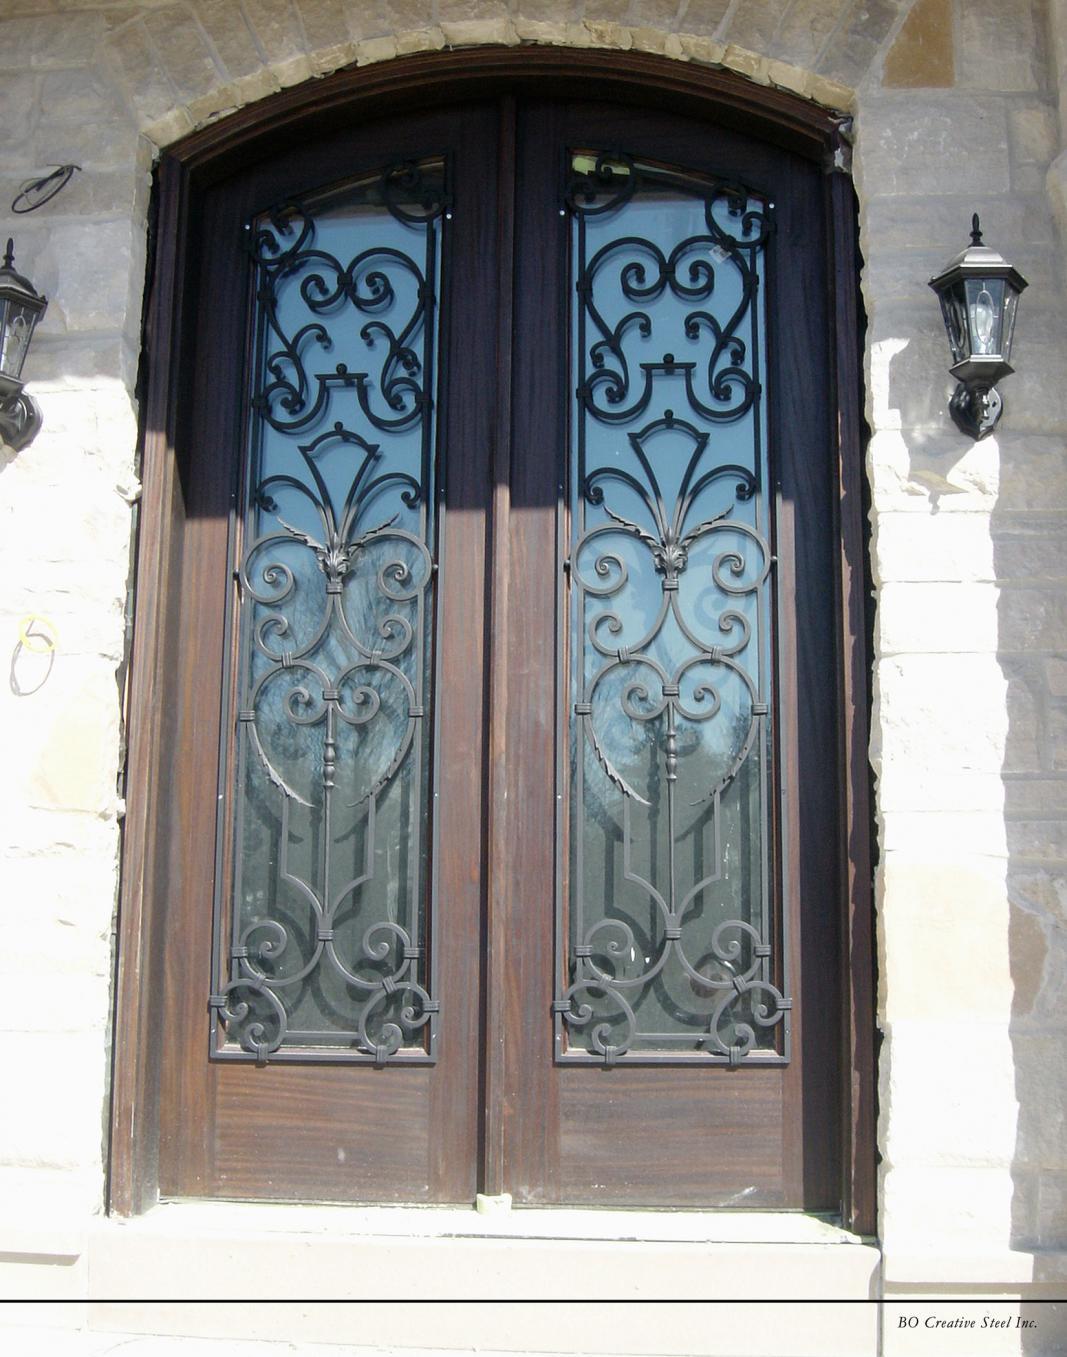 Custom Wrought Iron Work For Doors And Windows  Toronto